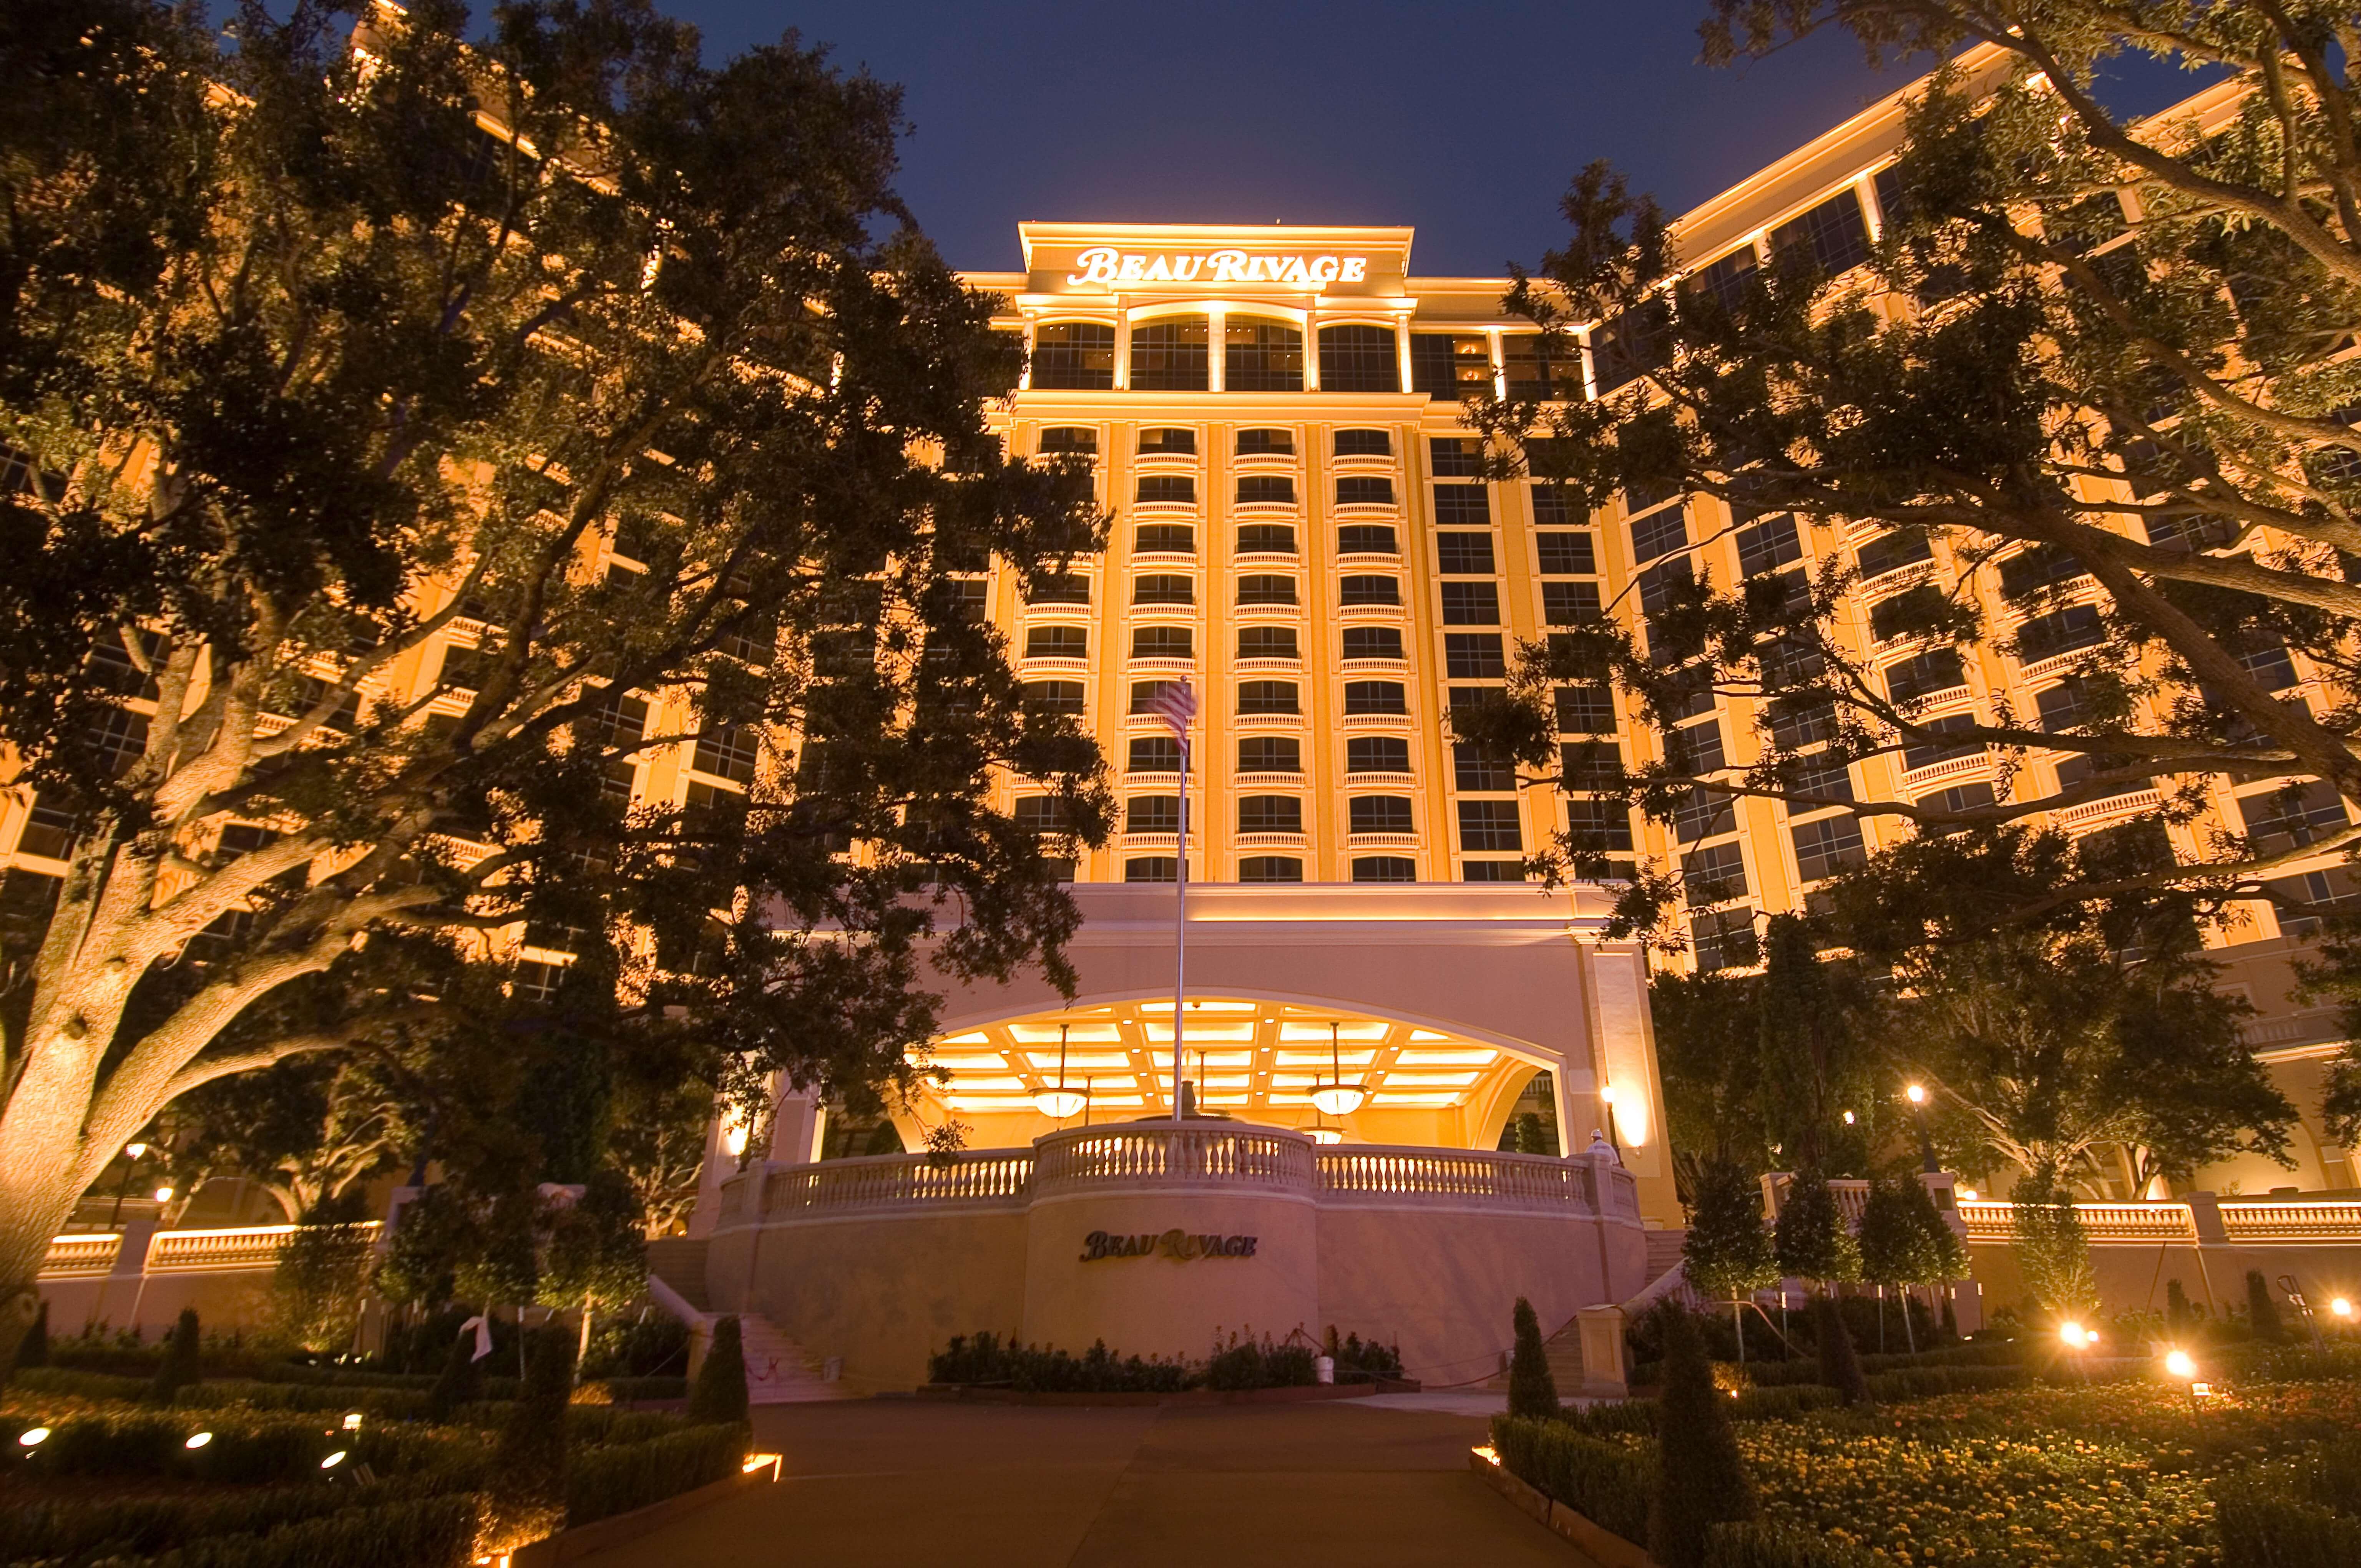 Beau Rivage Resort Casino Biloxi Mississippi